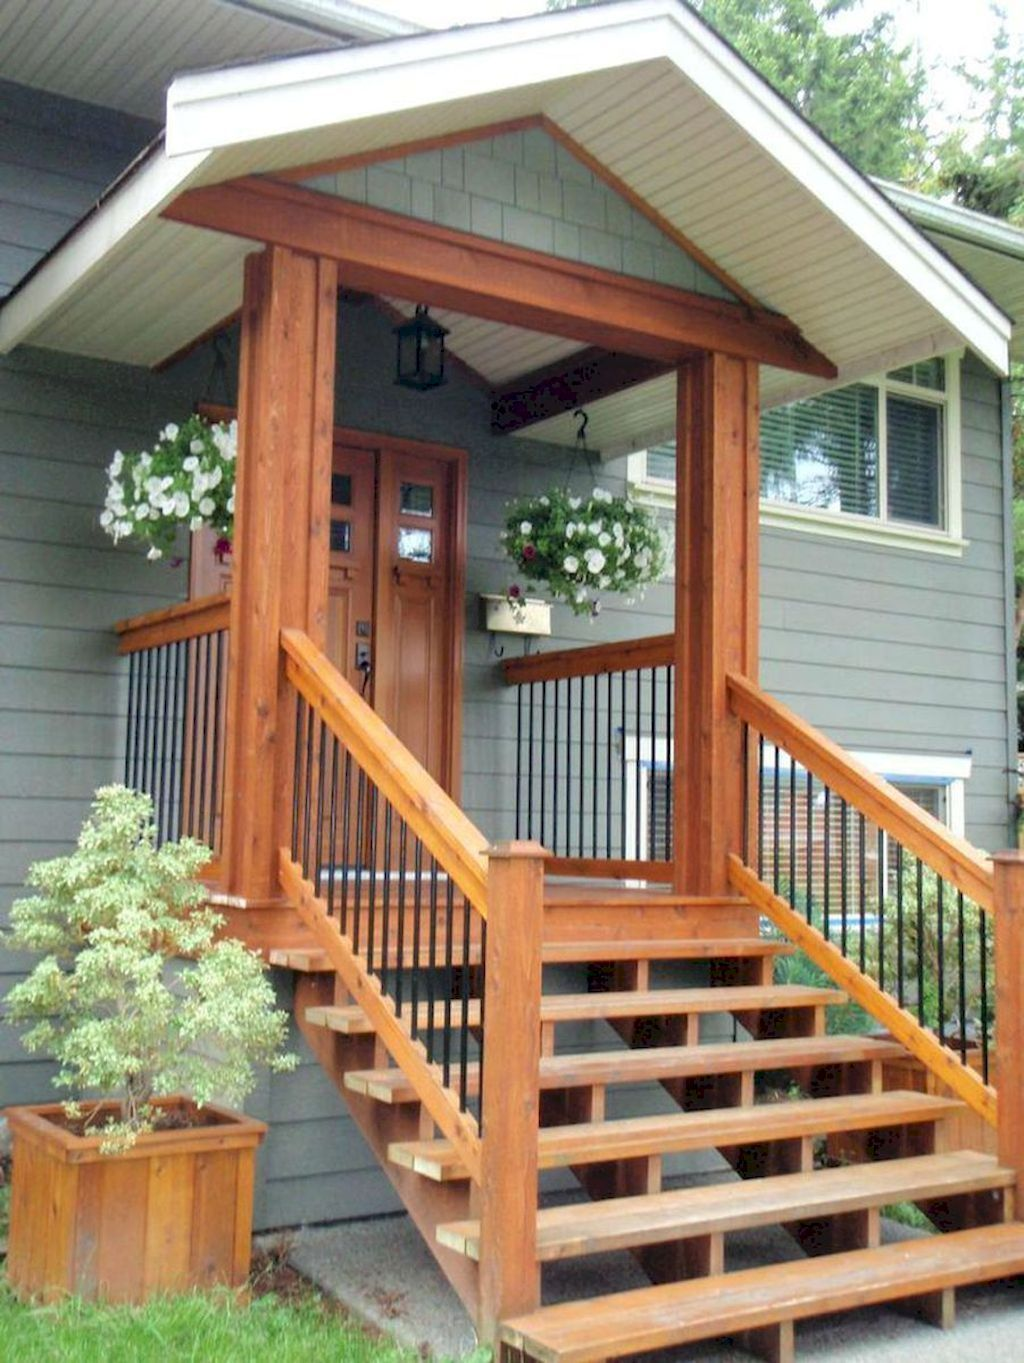 awesome rustic farmhouse porch decor ideas come u sit a spell